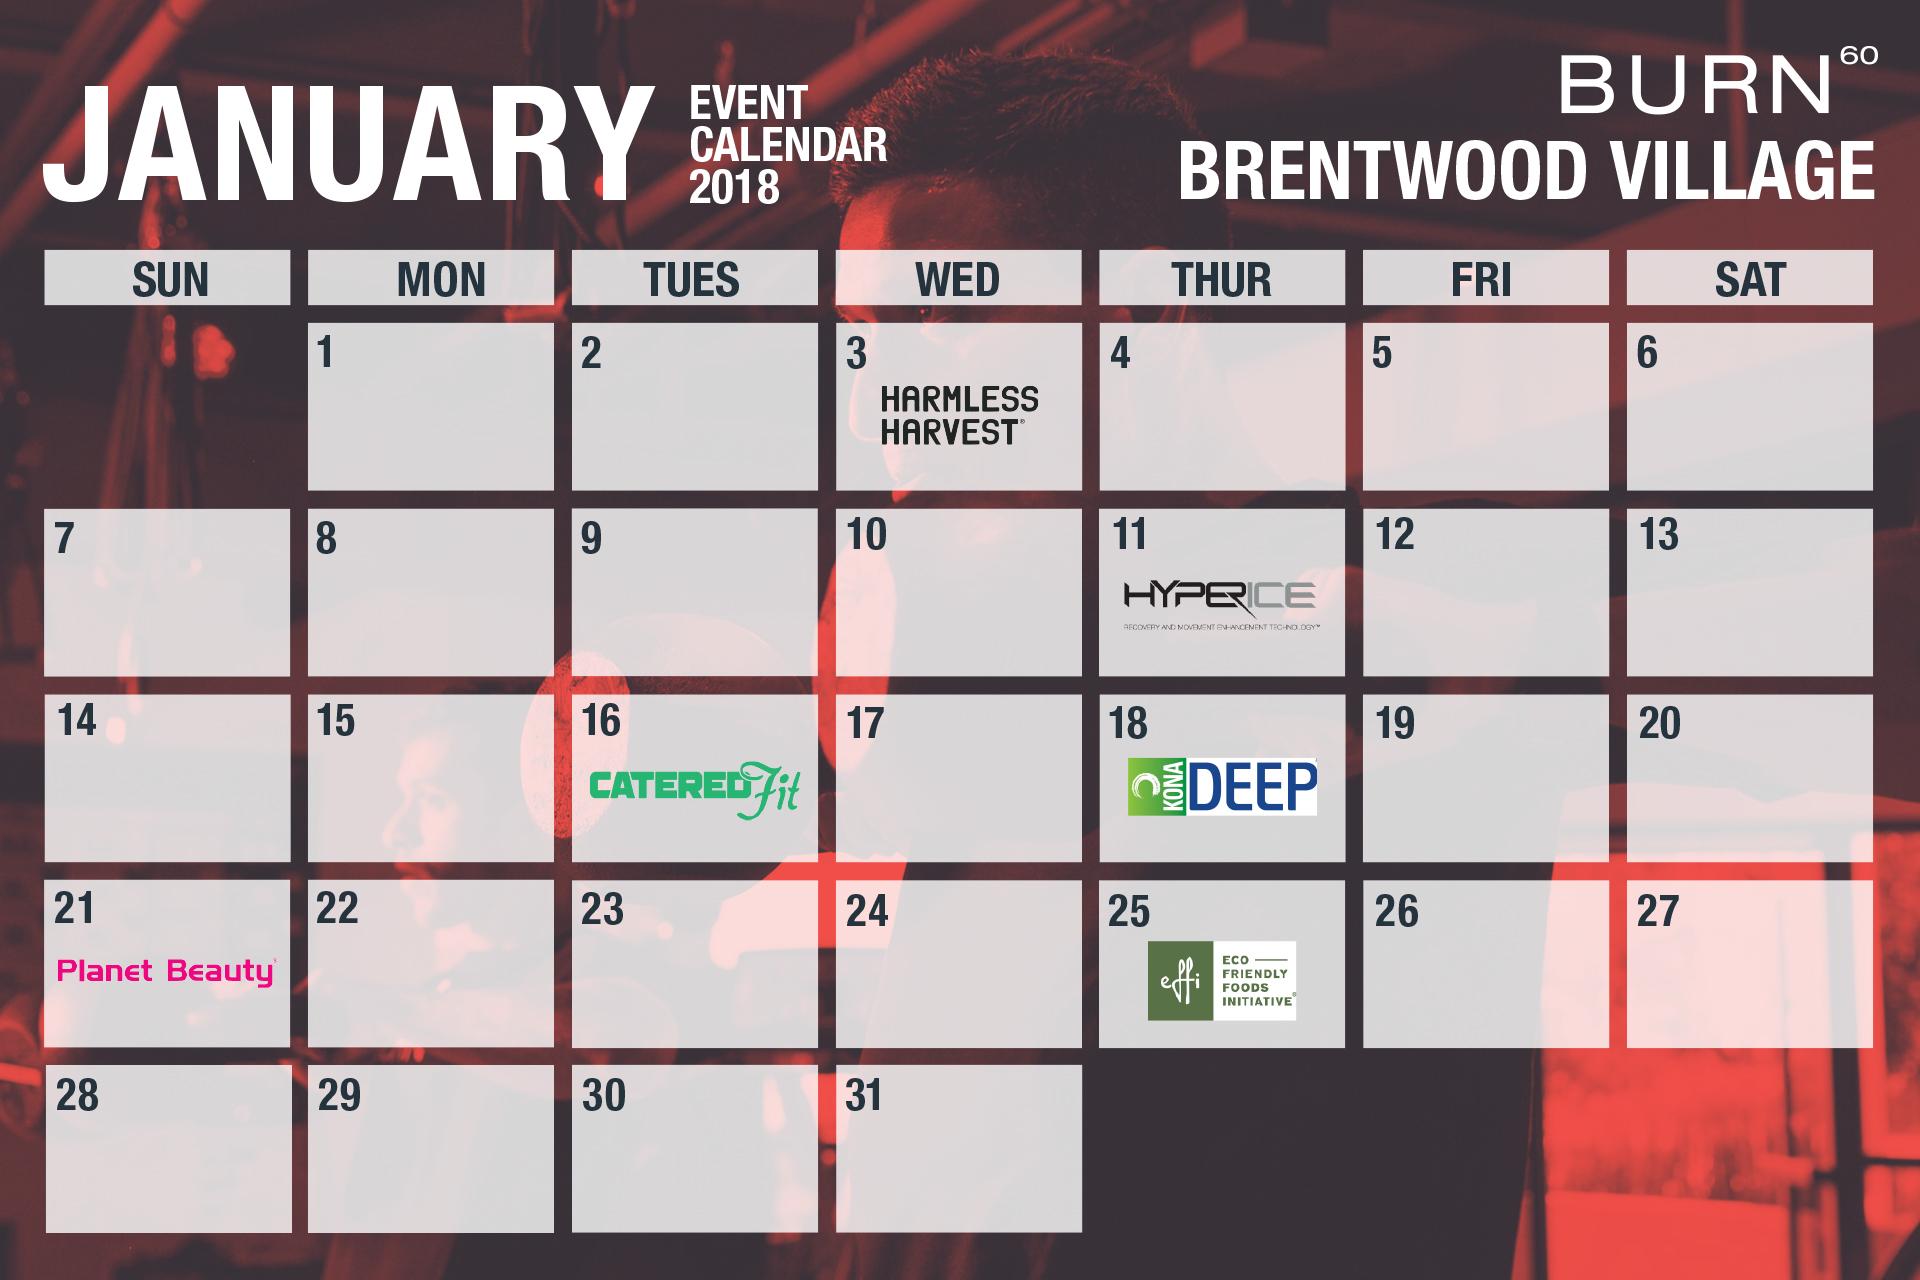 january btwd calendar.jpg